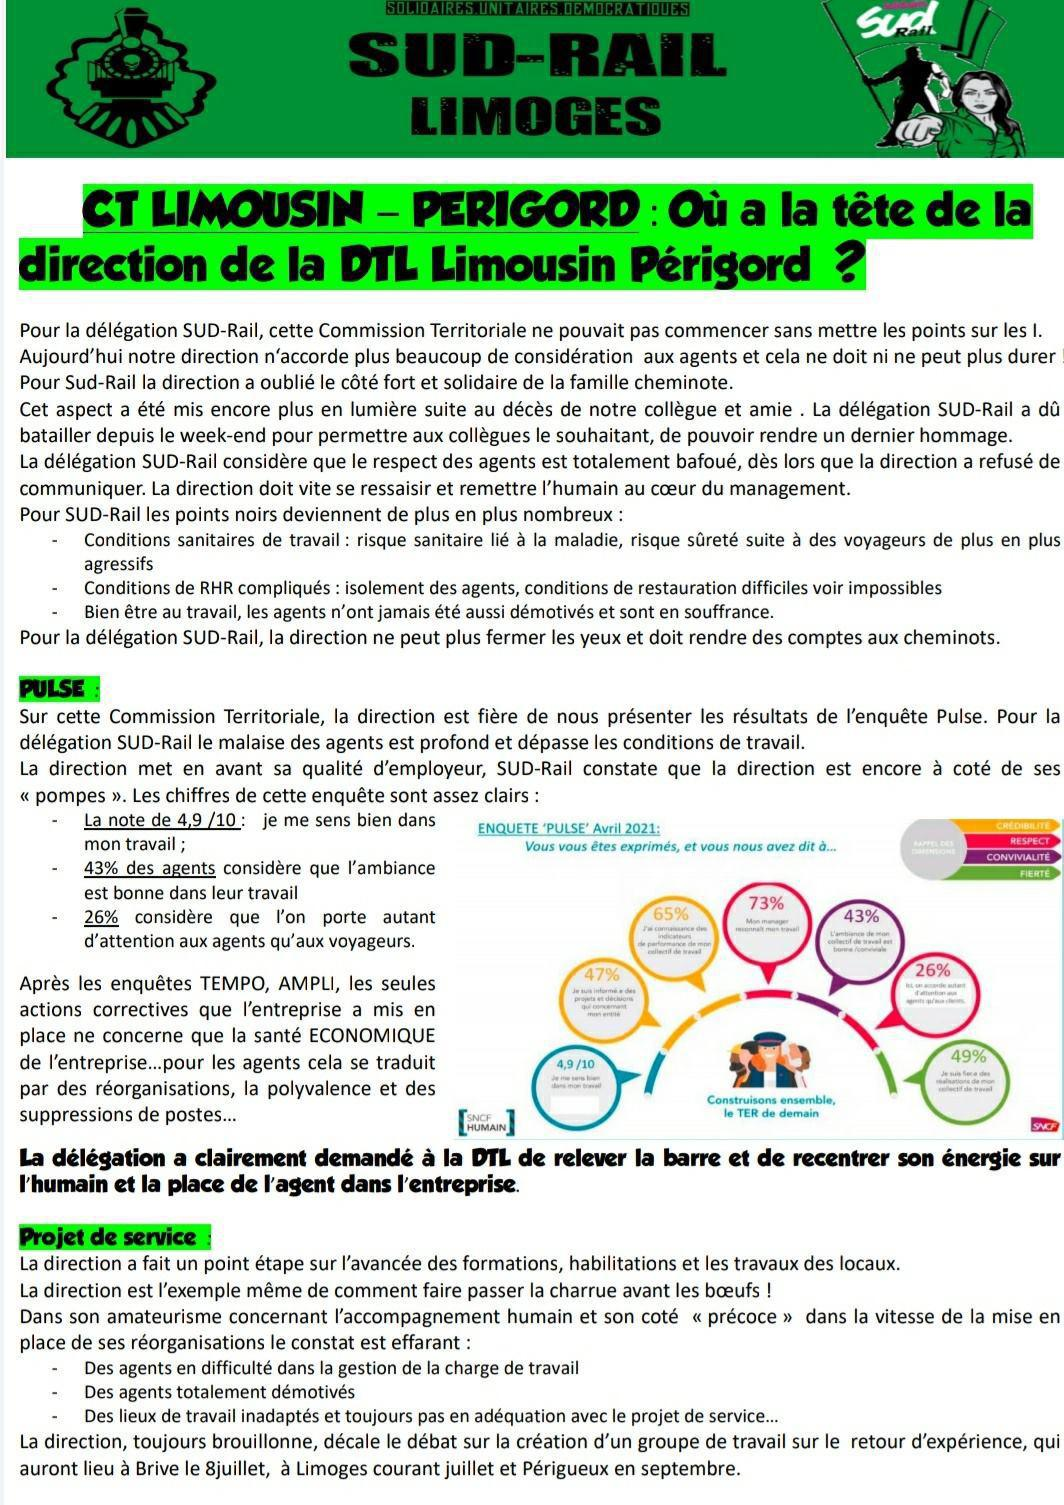 Où a la tête de la direction de la DTL Limousin Périgord ?